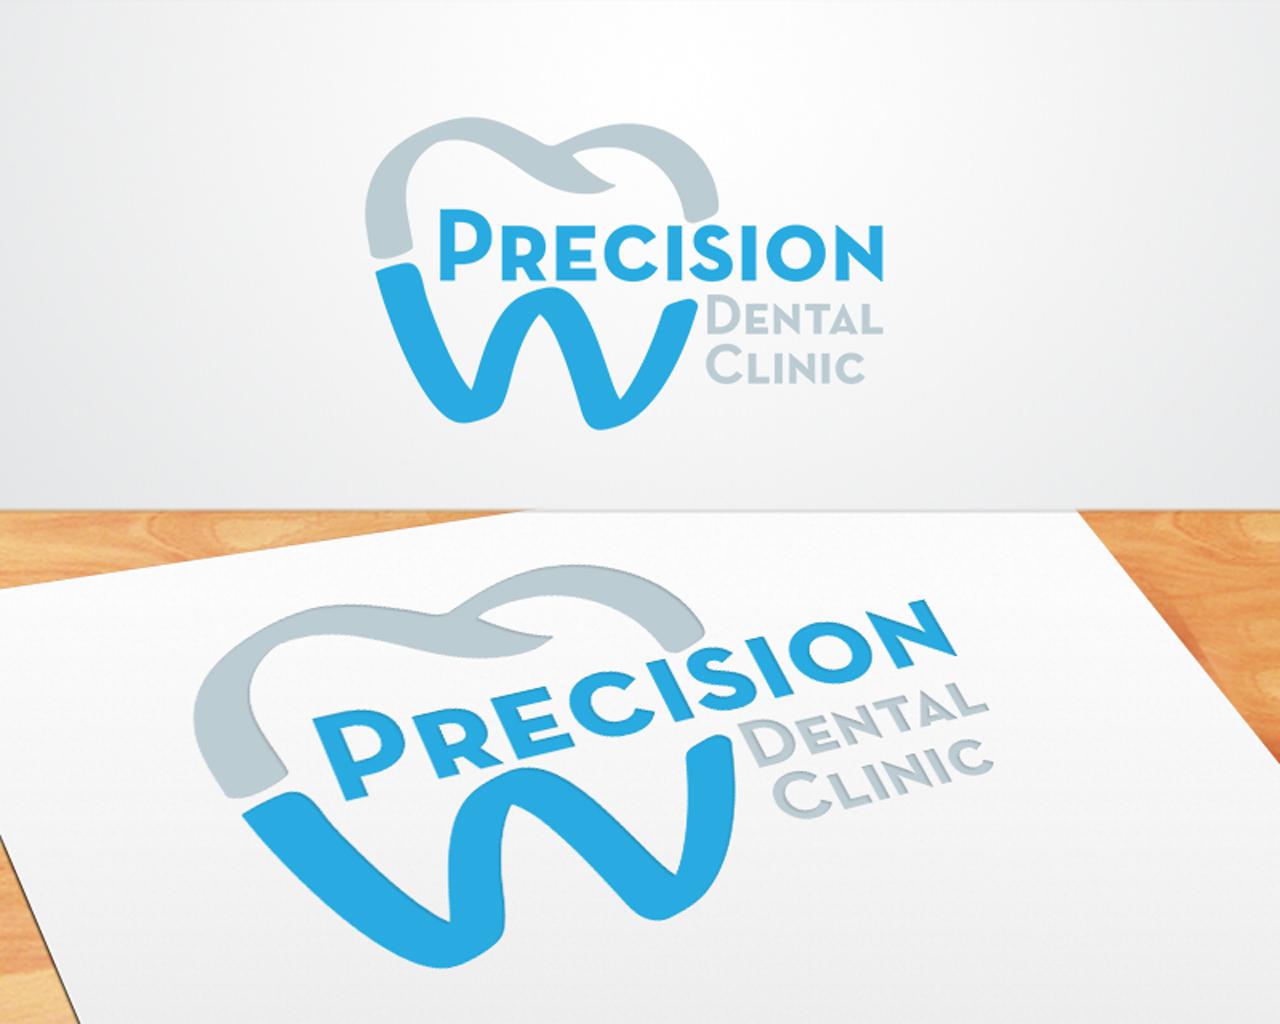 Logo Design by mosby - Entry No. 13 in the Logo Design Contest Captivating Logo Design for Precision Dental Clinic.